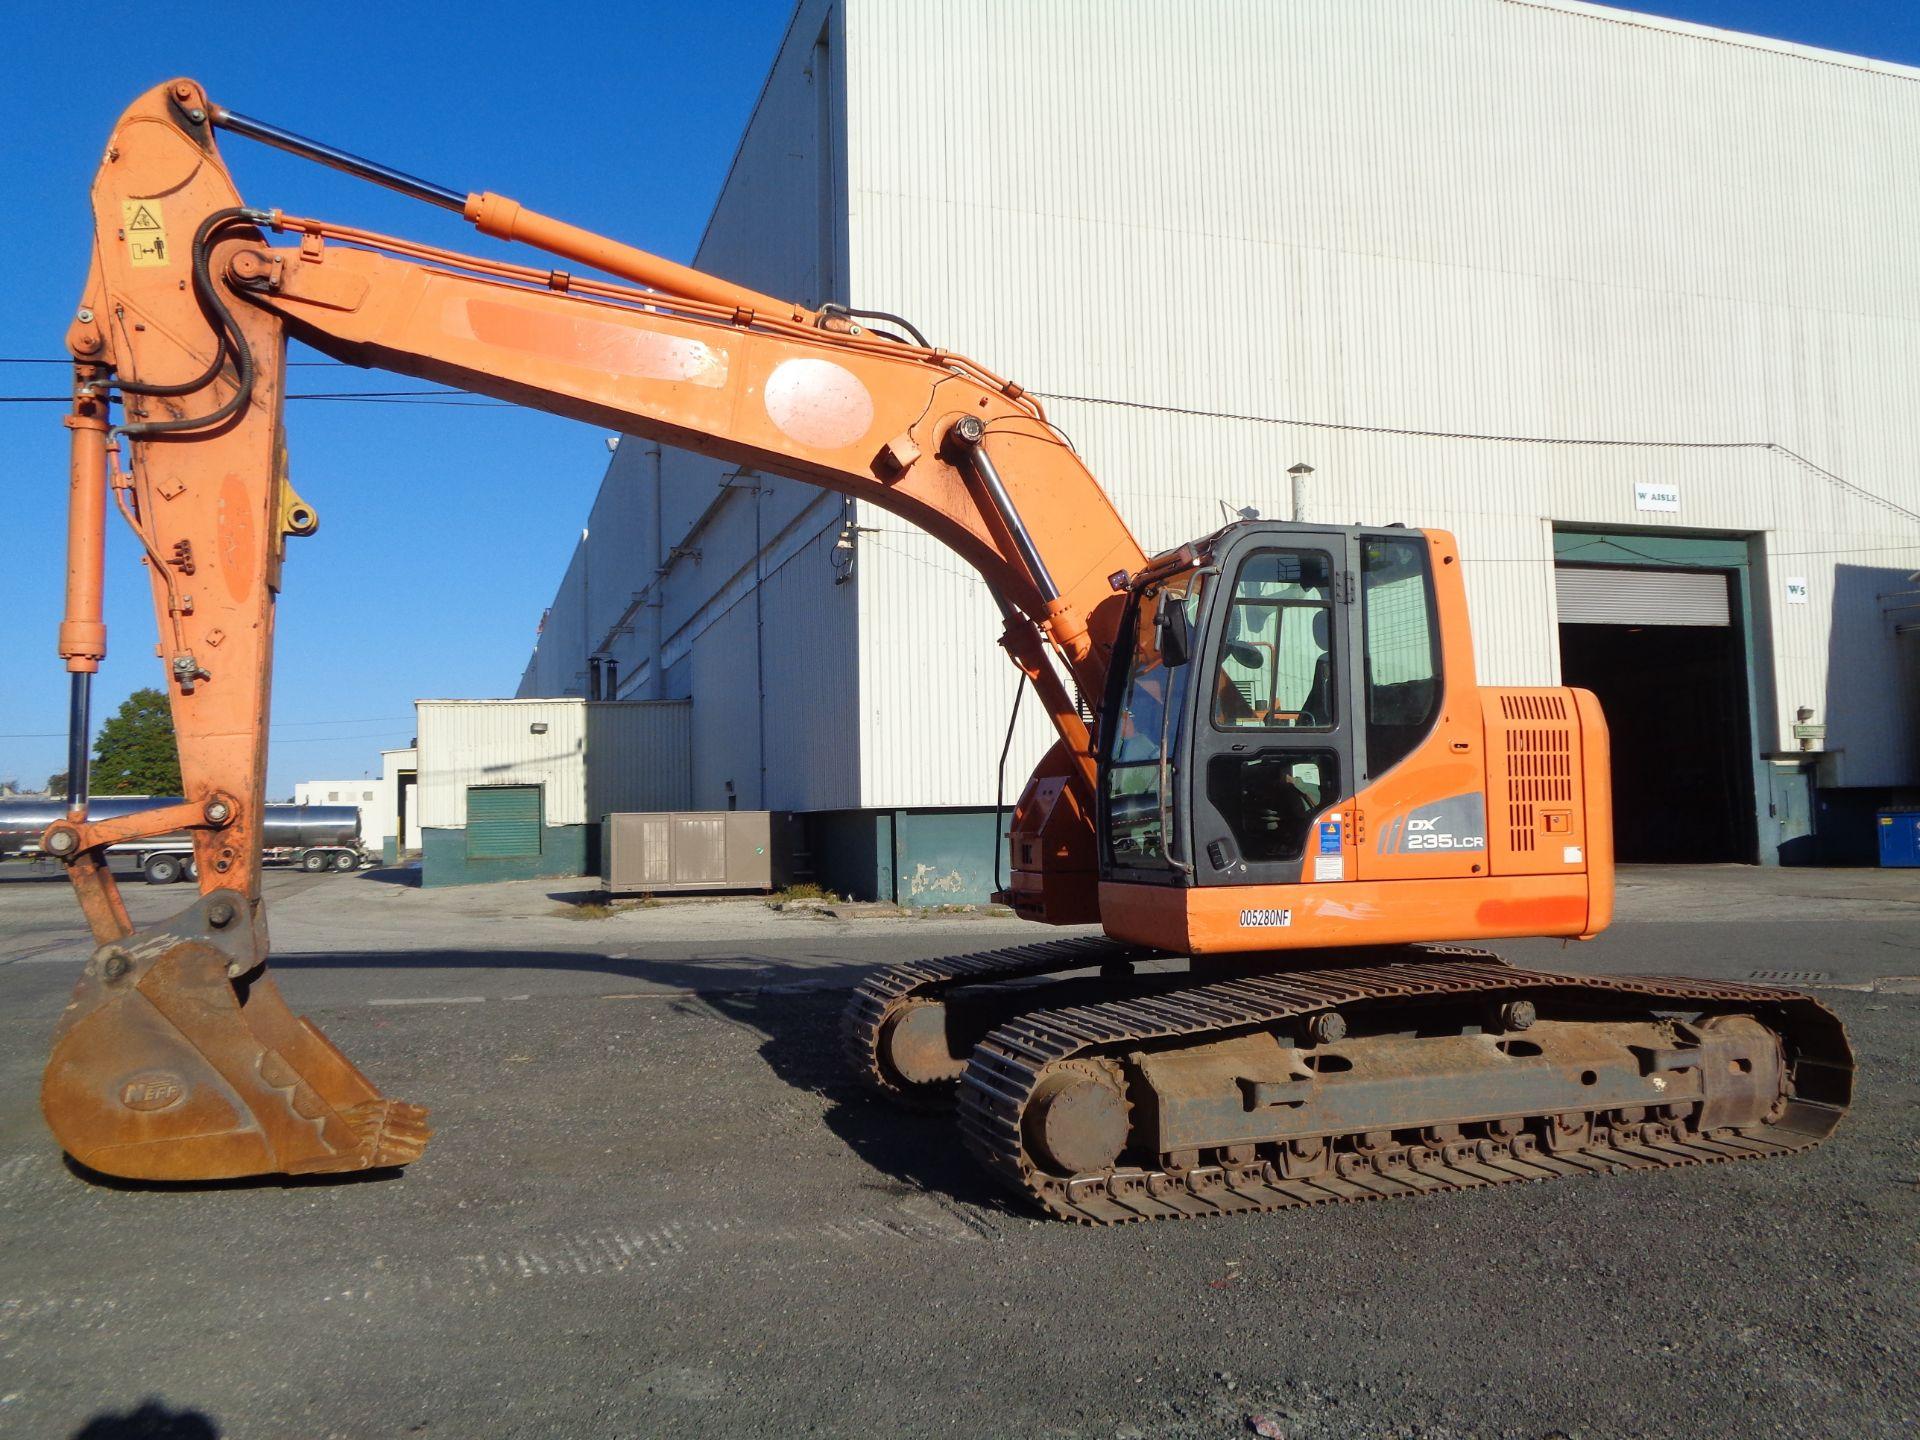 Lot 21 - 2013 Doosan DX235LCR Excavator